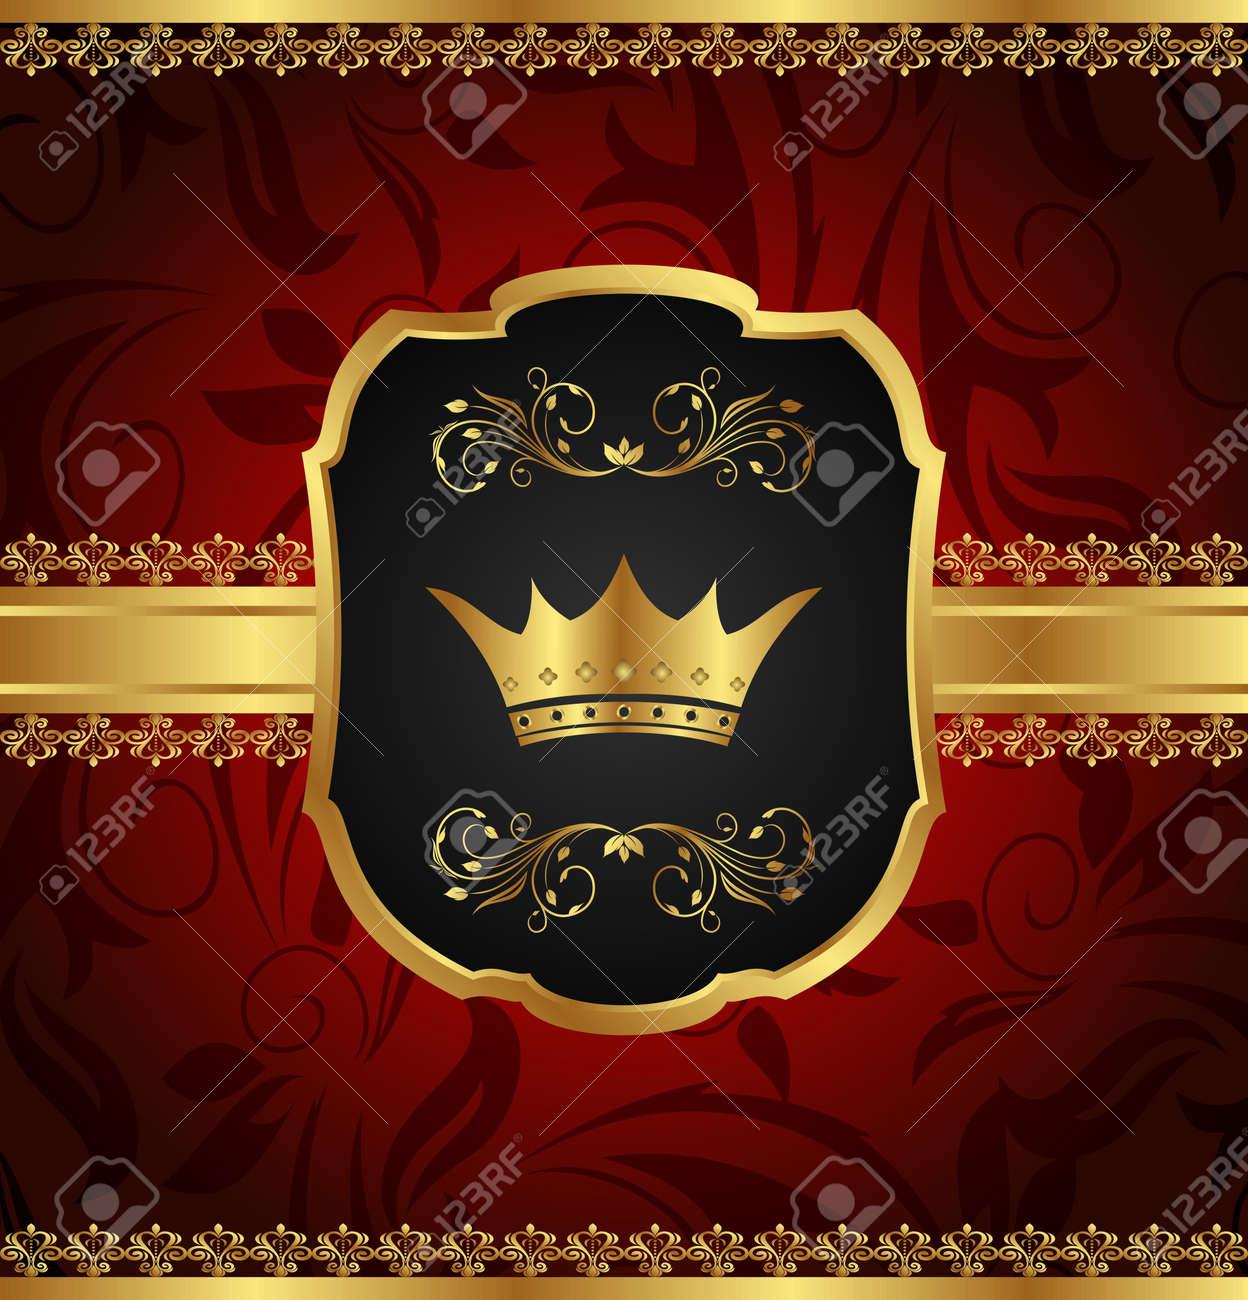 Illustration golden vintage frame with crown - vector Stock Photo - 9896131